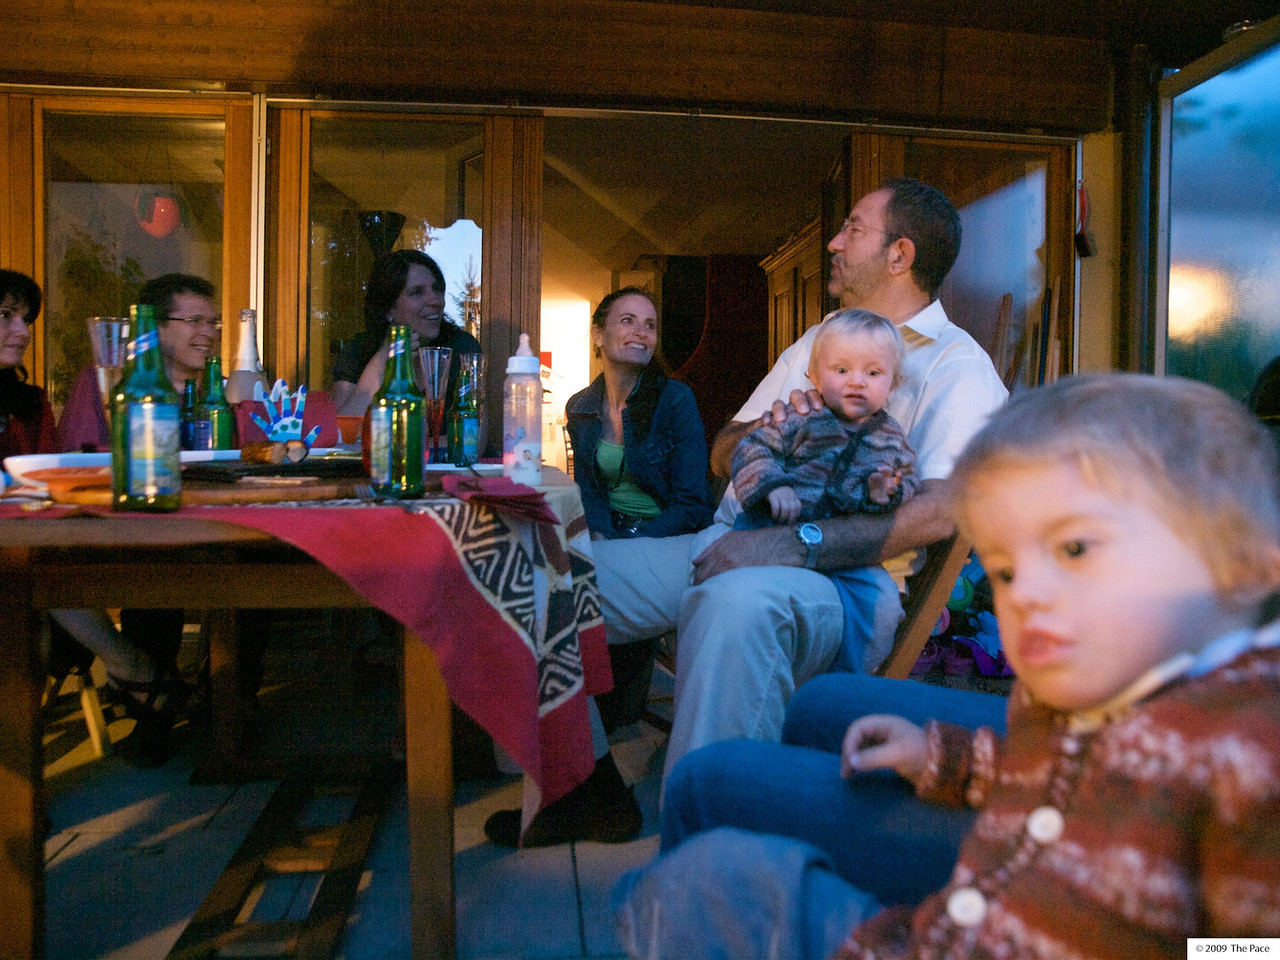 Monday 25th May 2009 - jokes beer and food